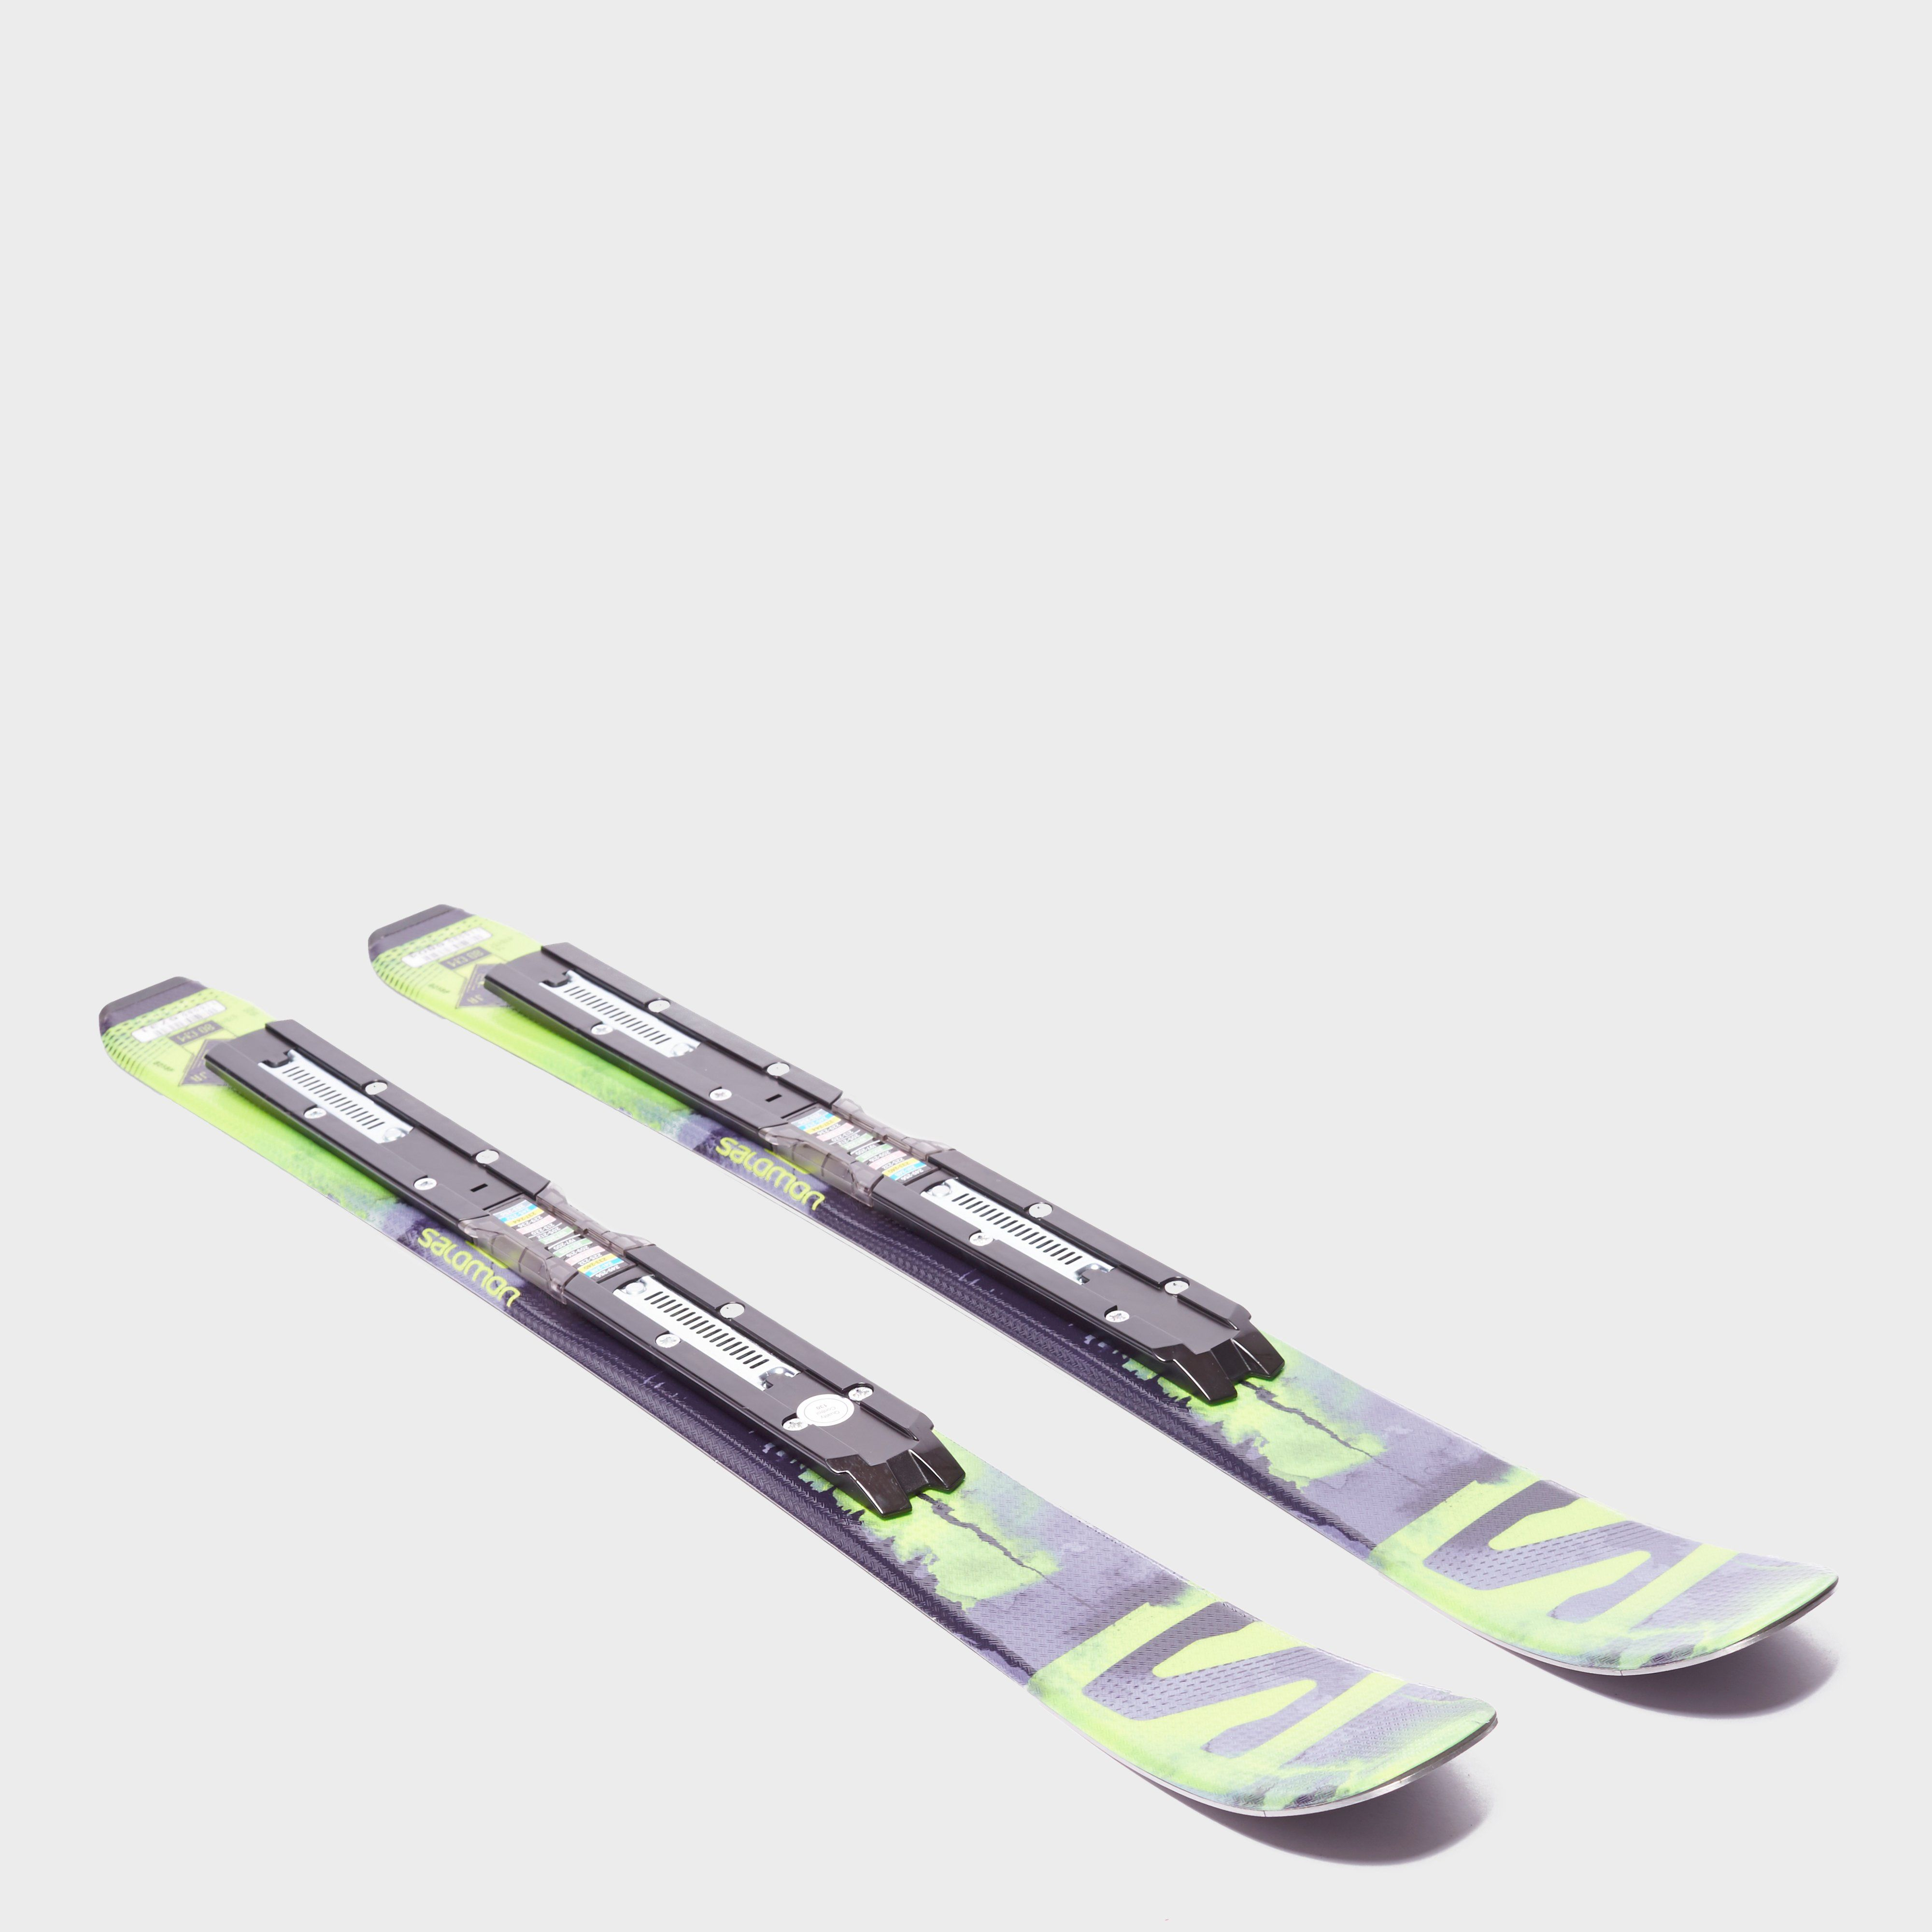 SALOMON Q-Lux Jr XS Skis with EZY 7 Bindings